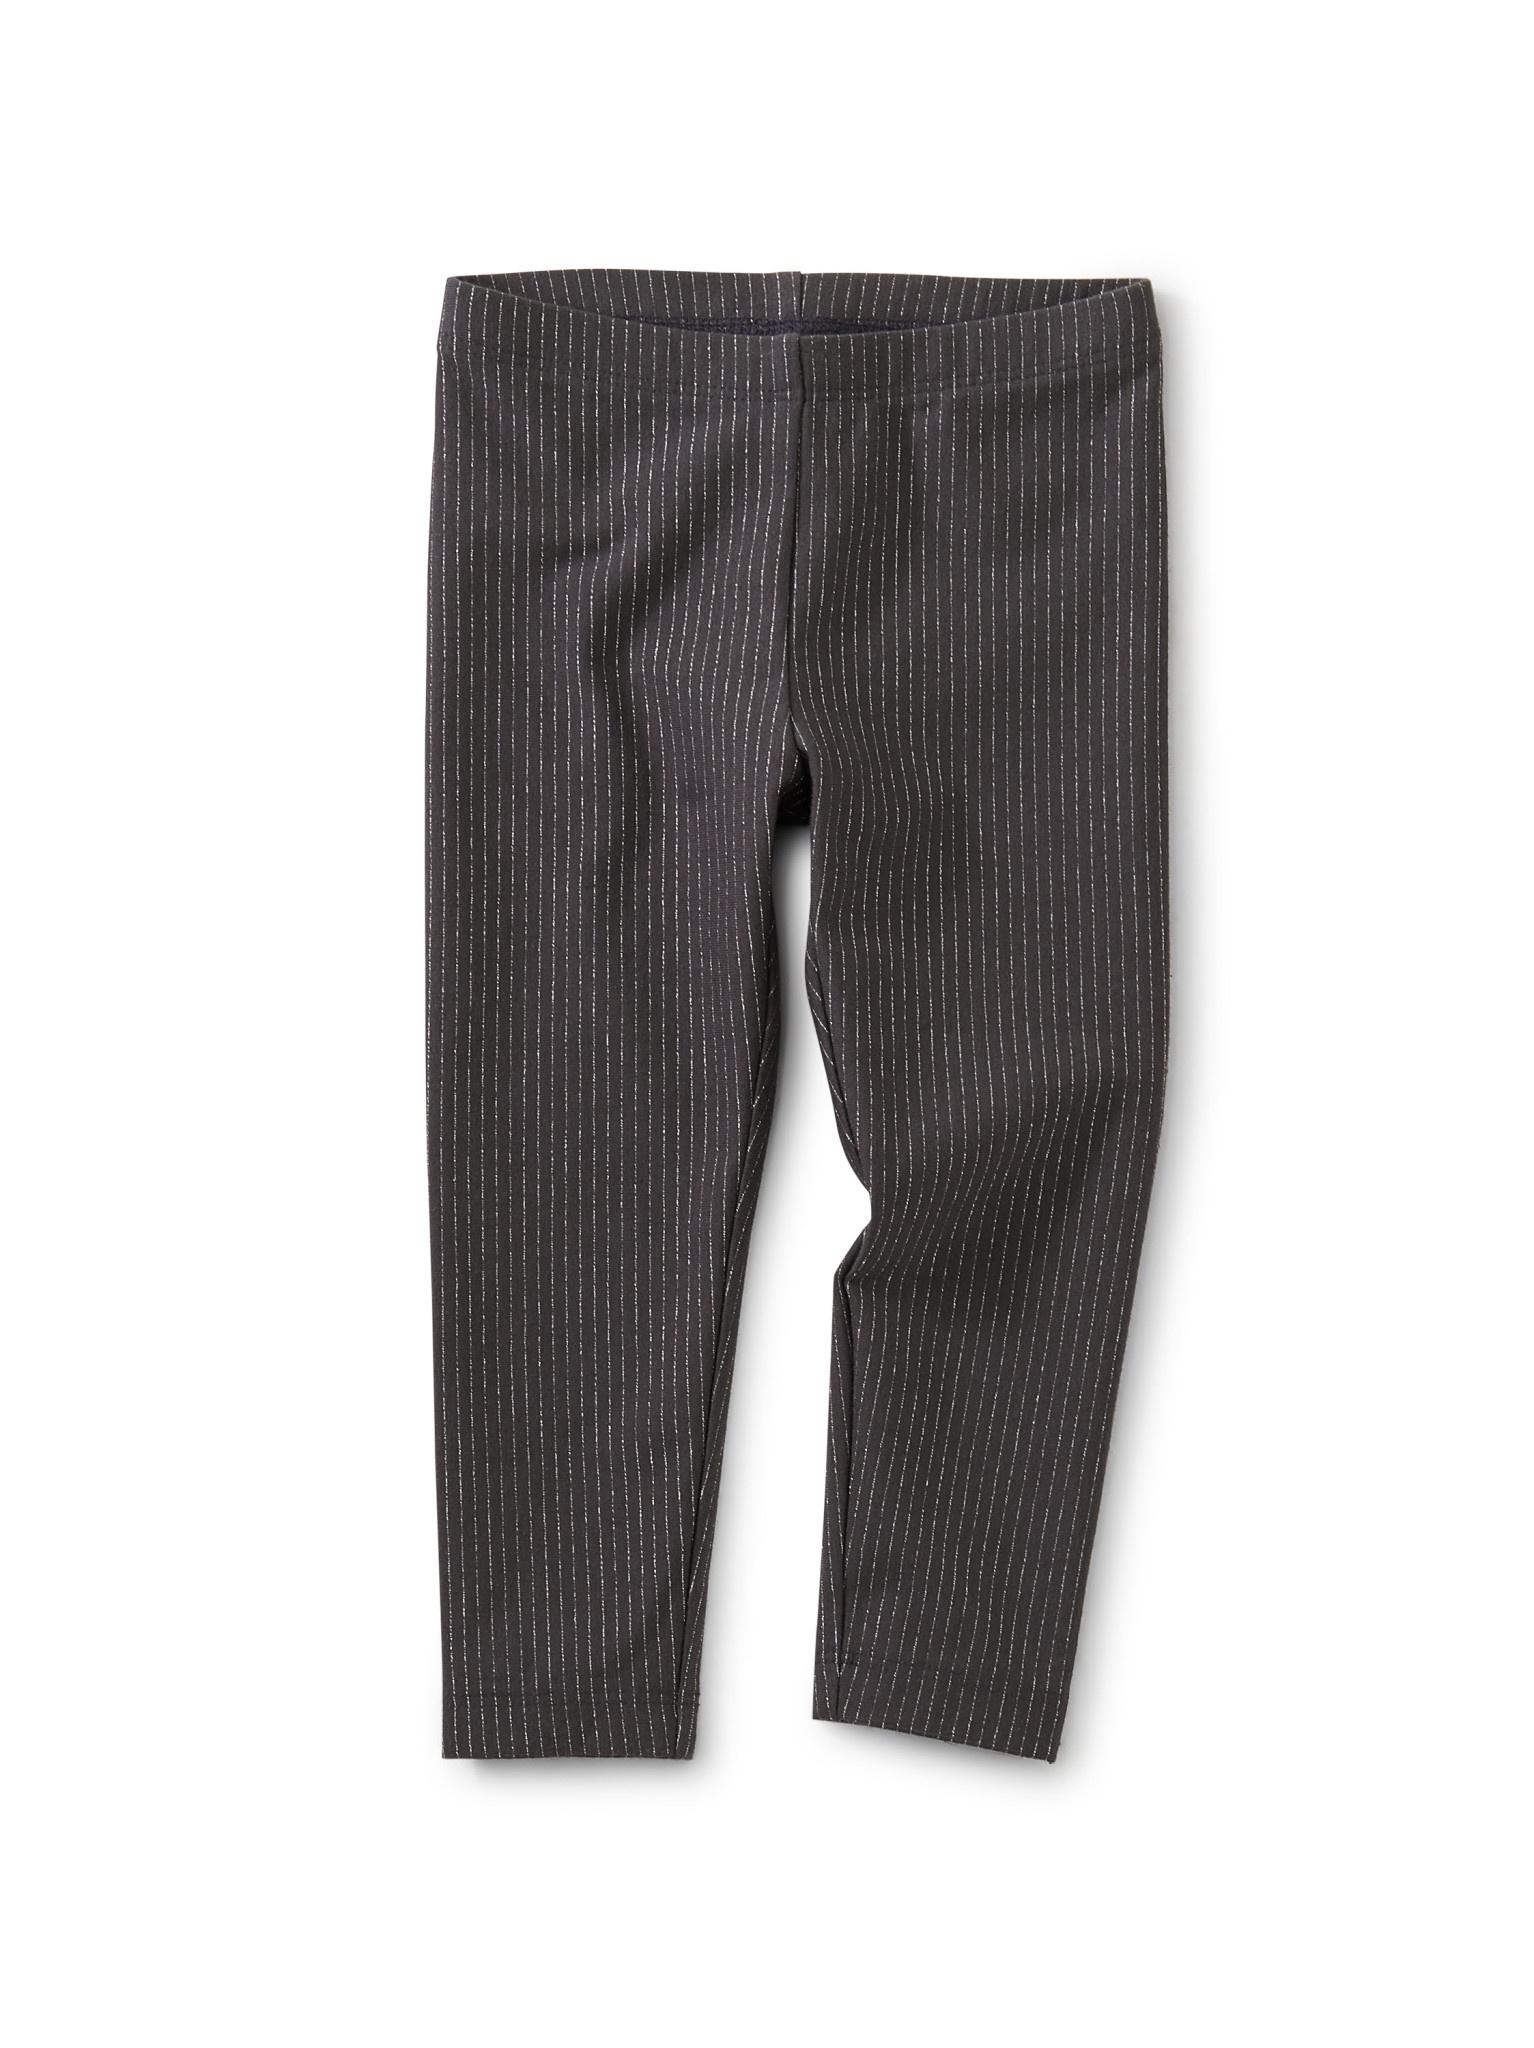 Tea Collection Sparkle Stripe Baby Leggings- Pepper